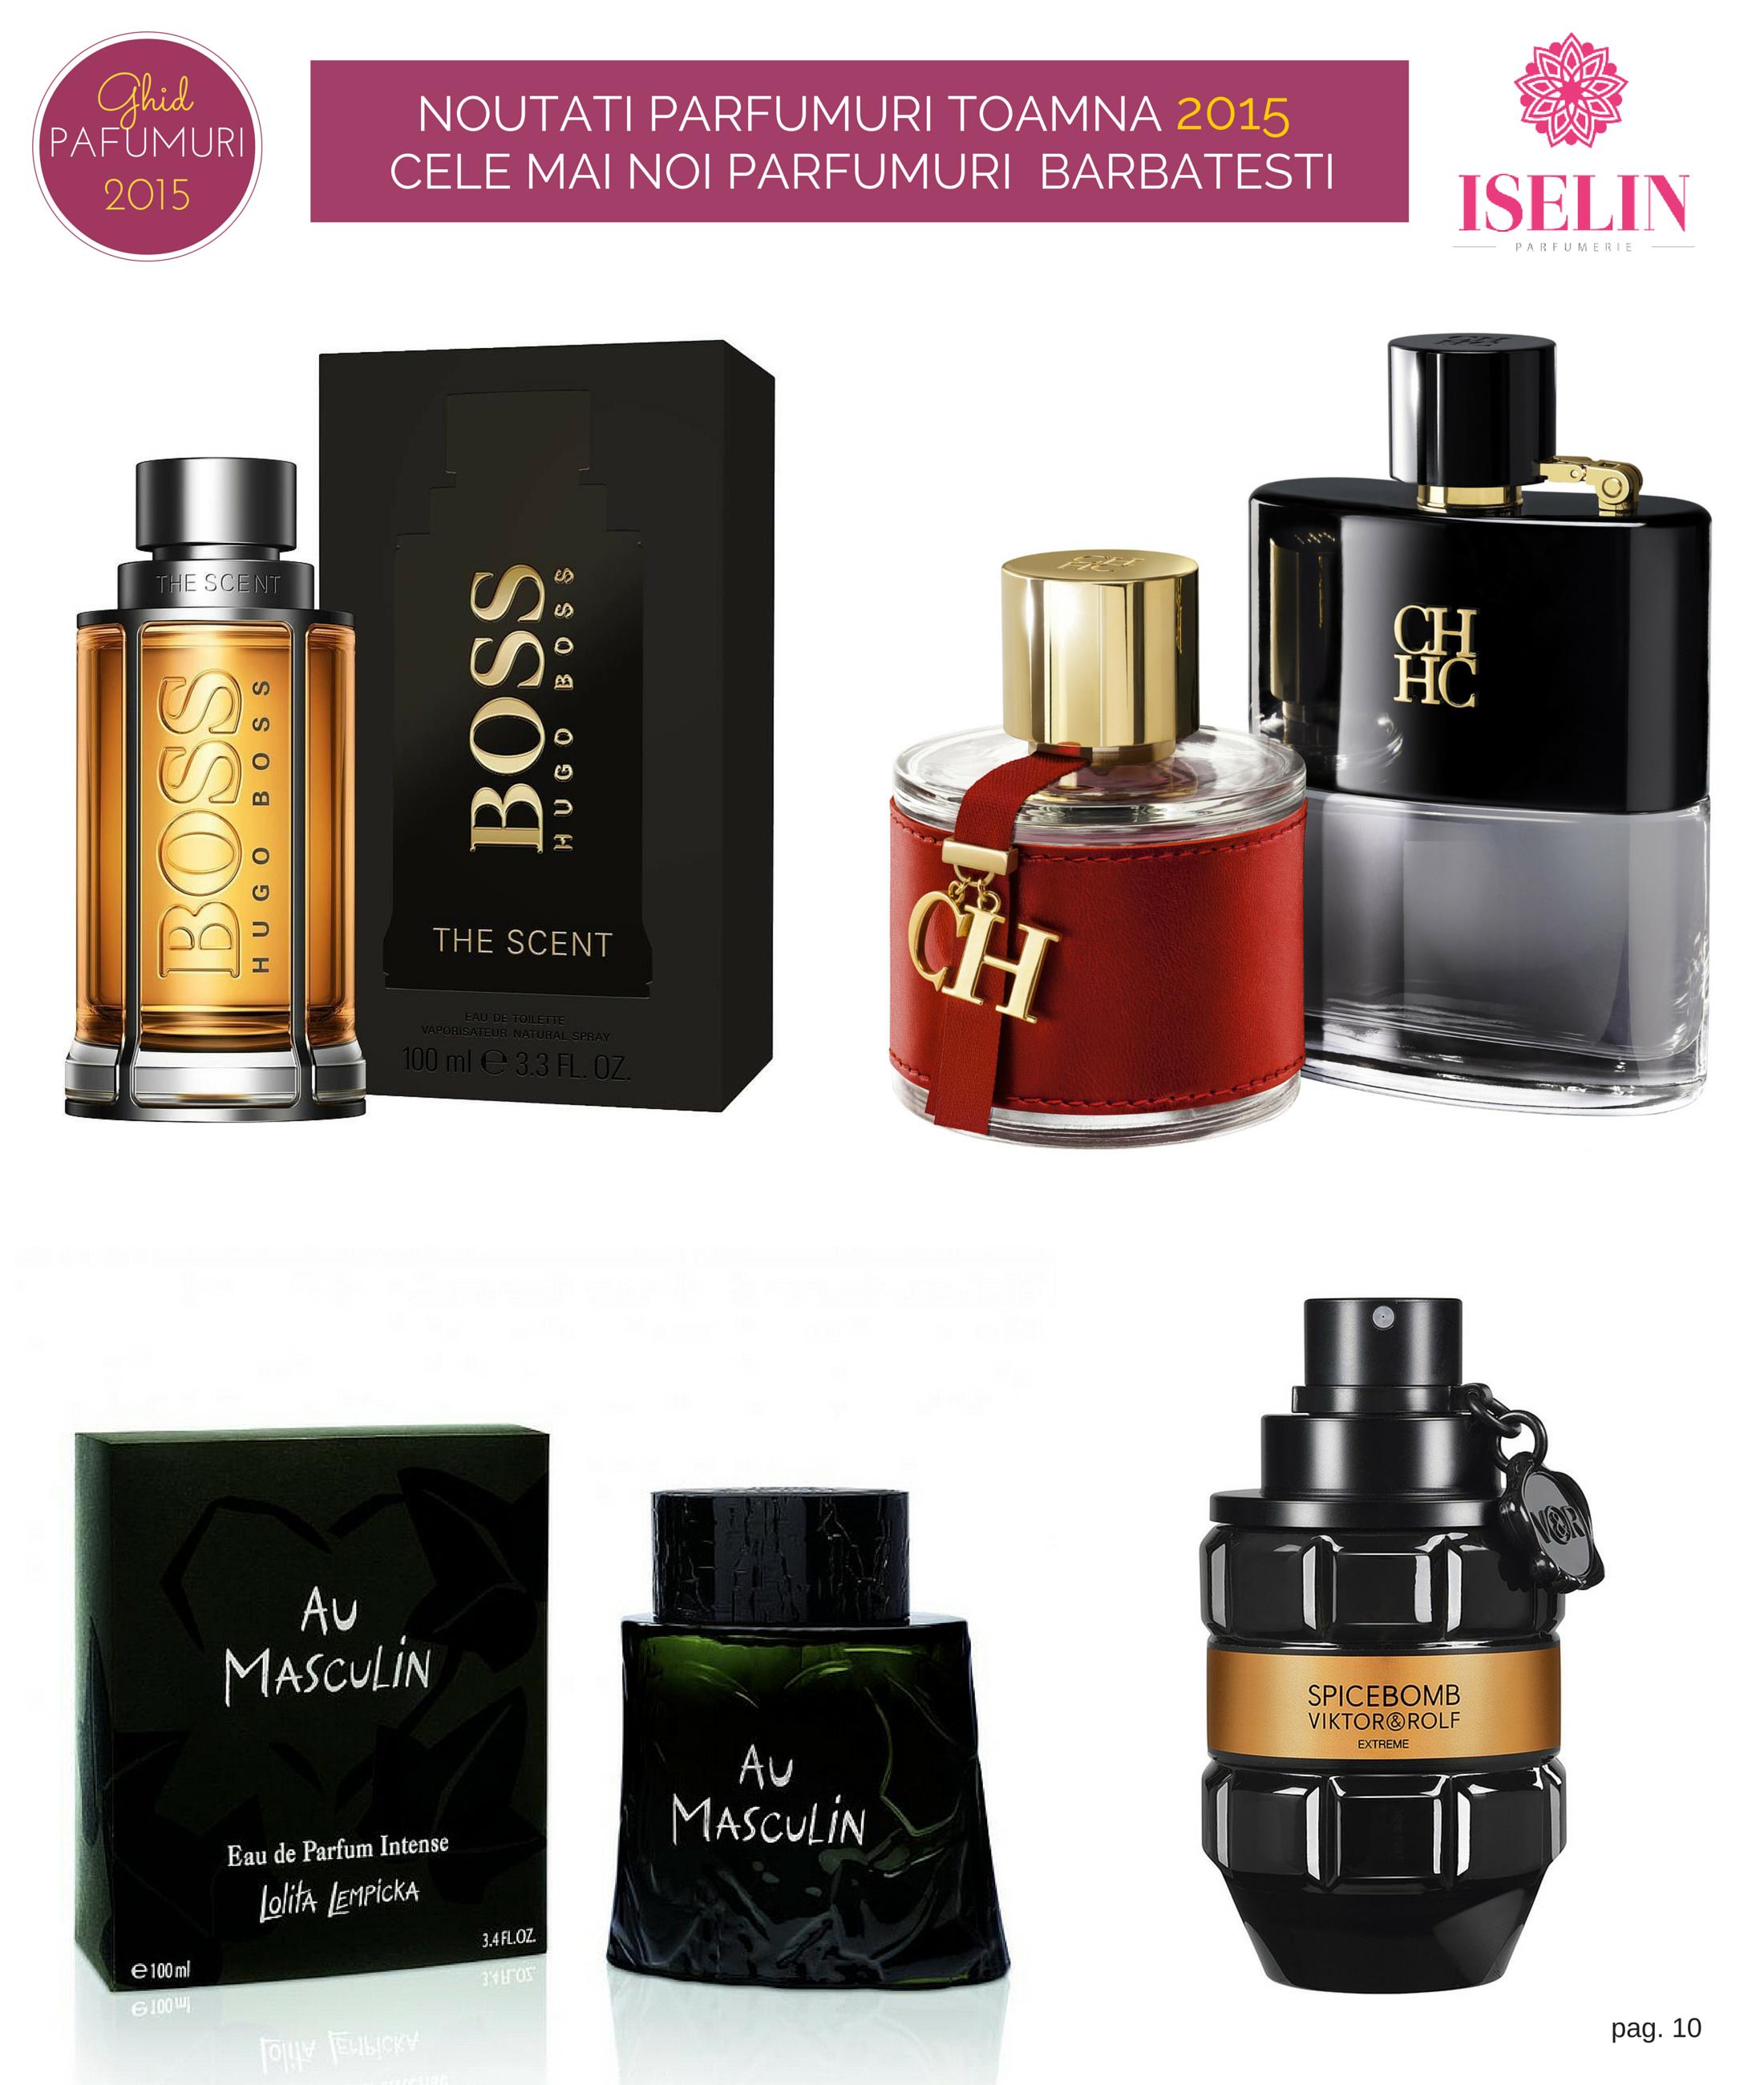 Pin By Iselinro On Ghid Parfumuri 2015 Pentru Barbati Perfume